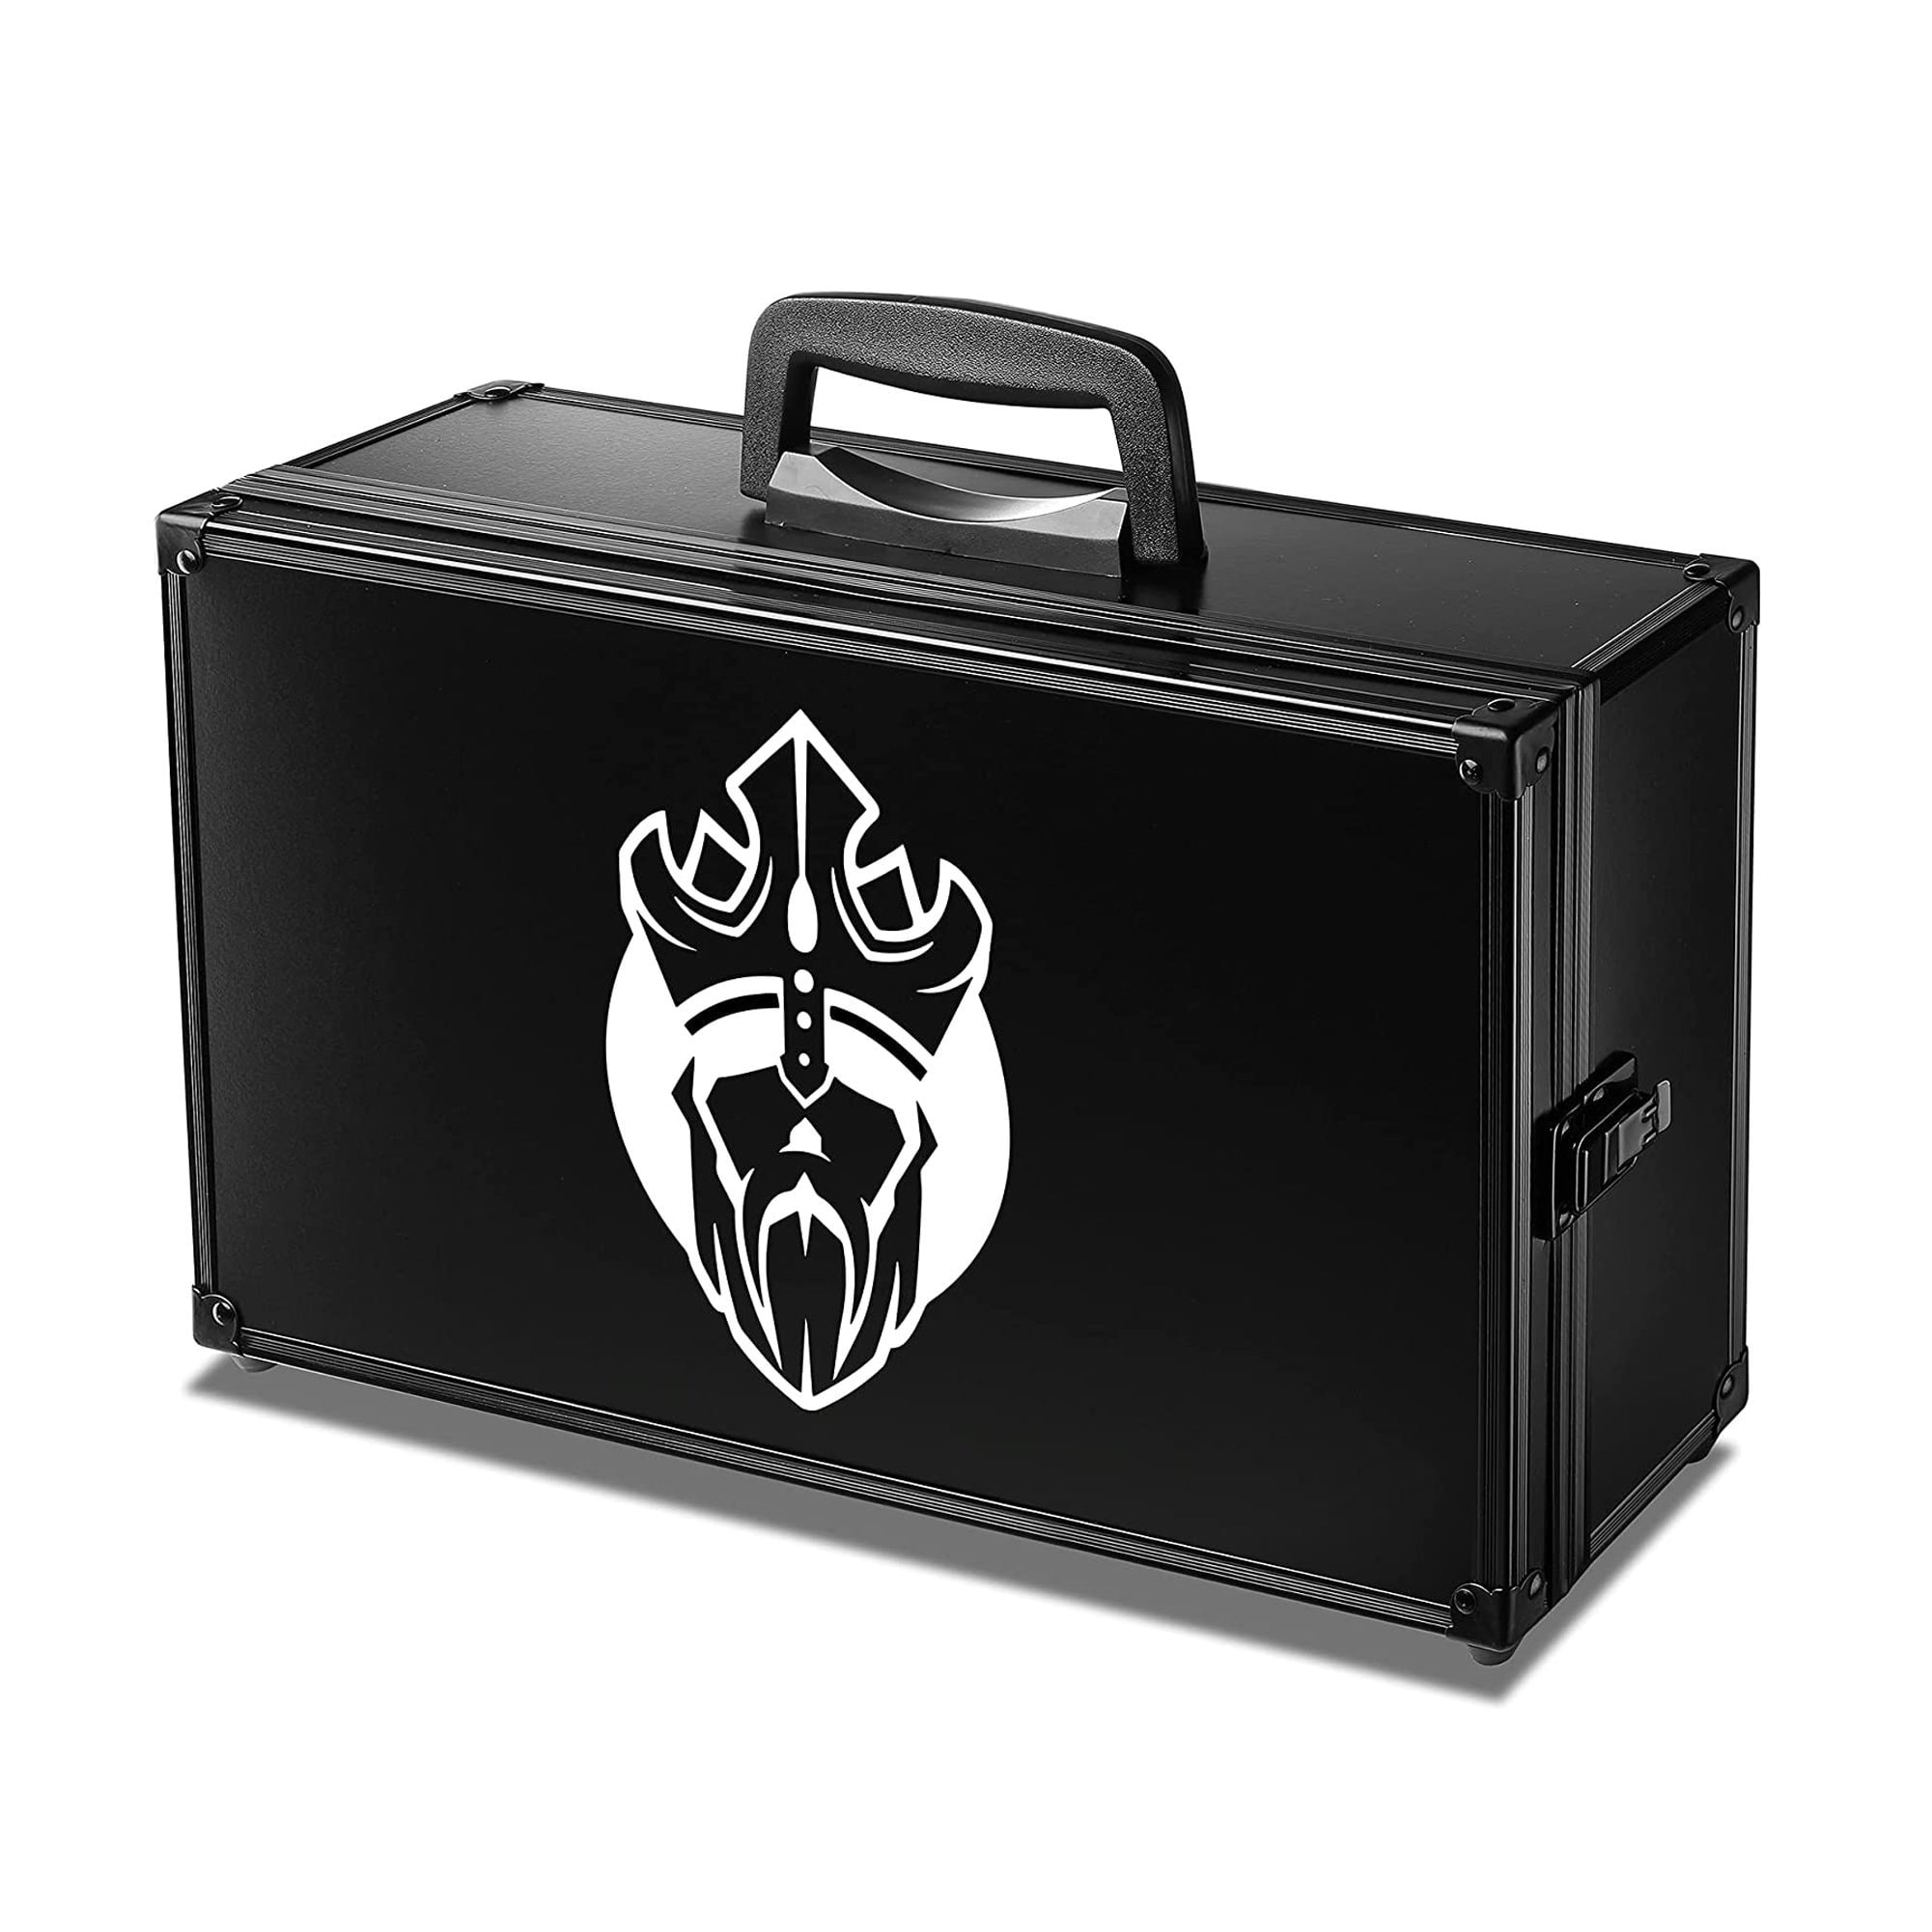 Cardkingpro RPG Game Storage Case BBB Large With Storm King Logo